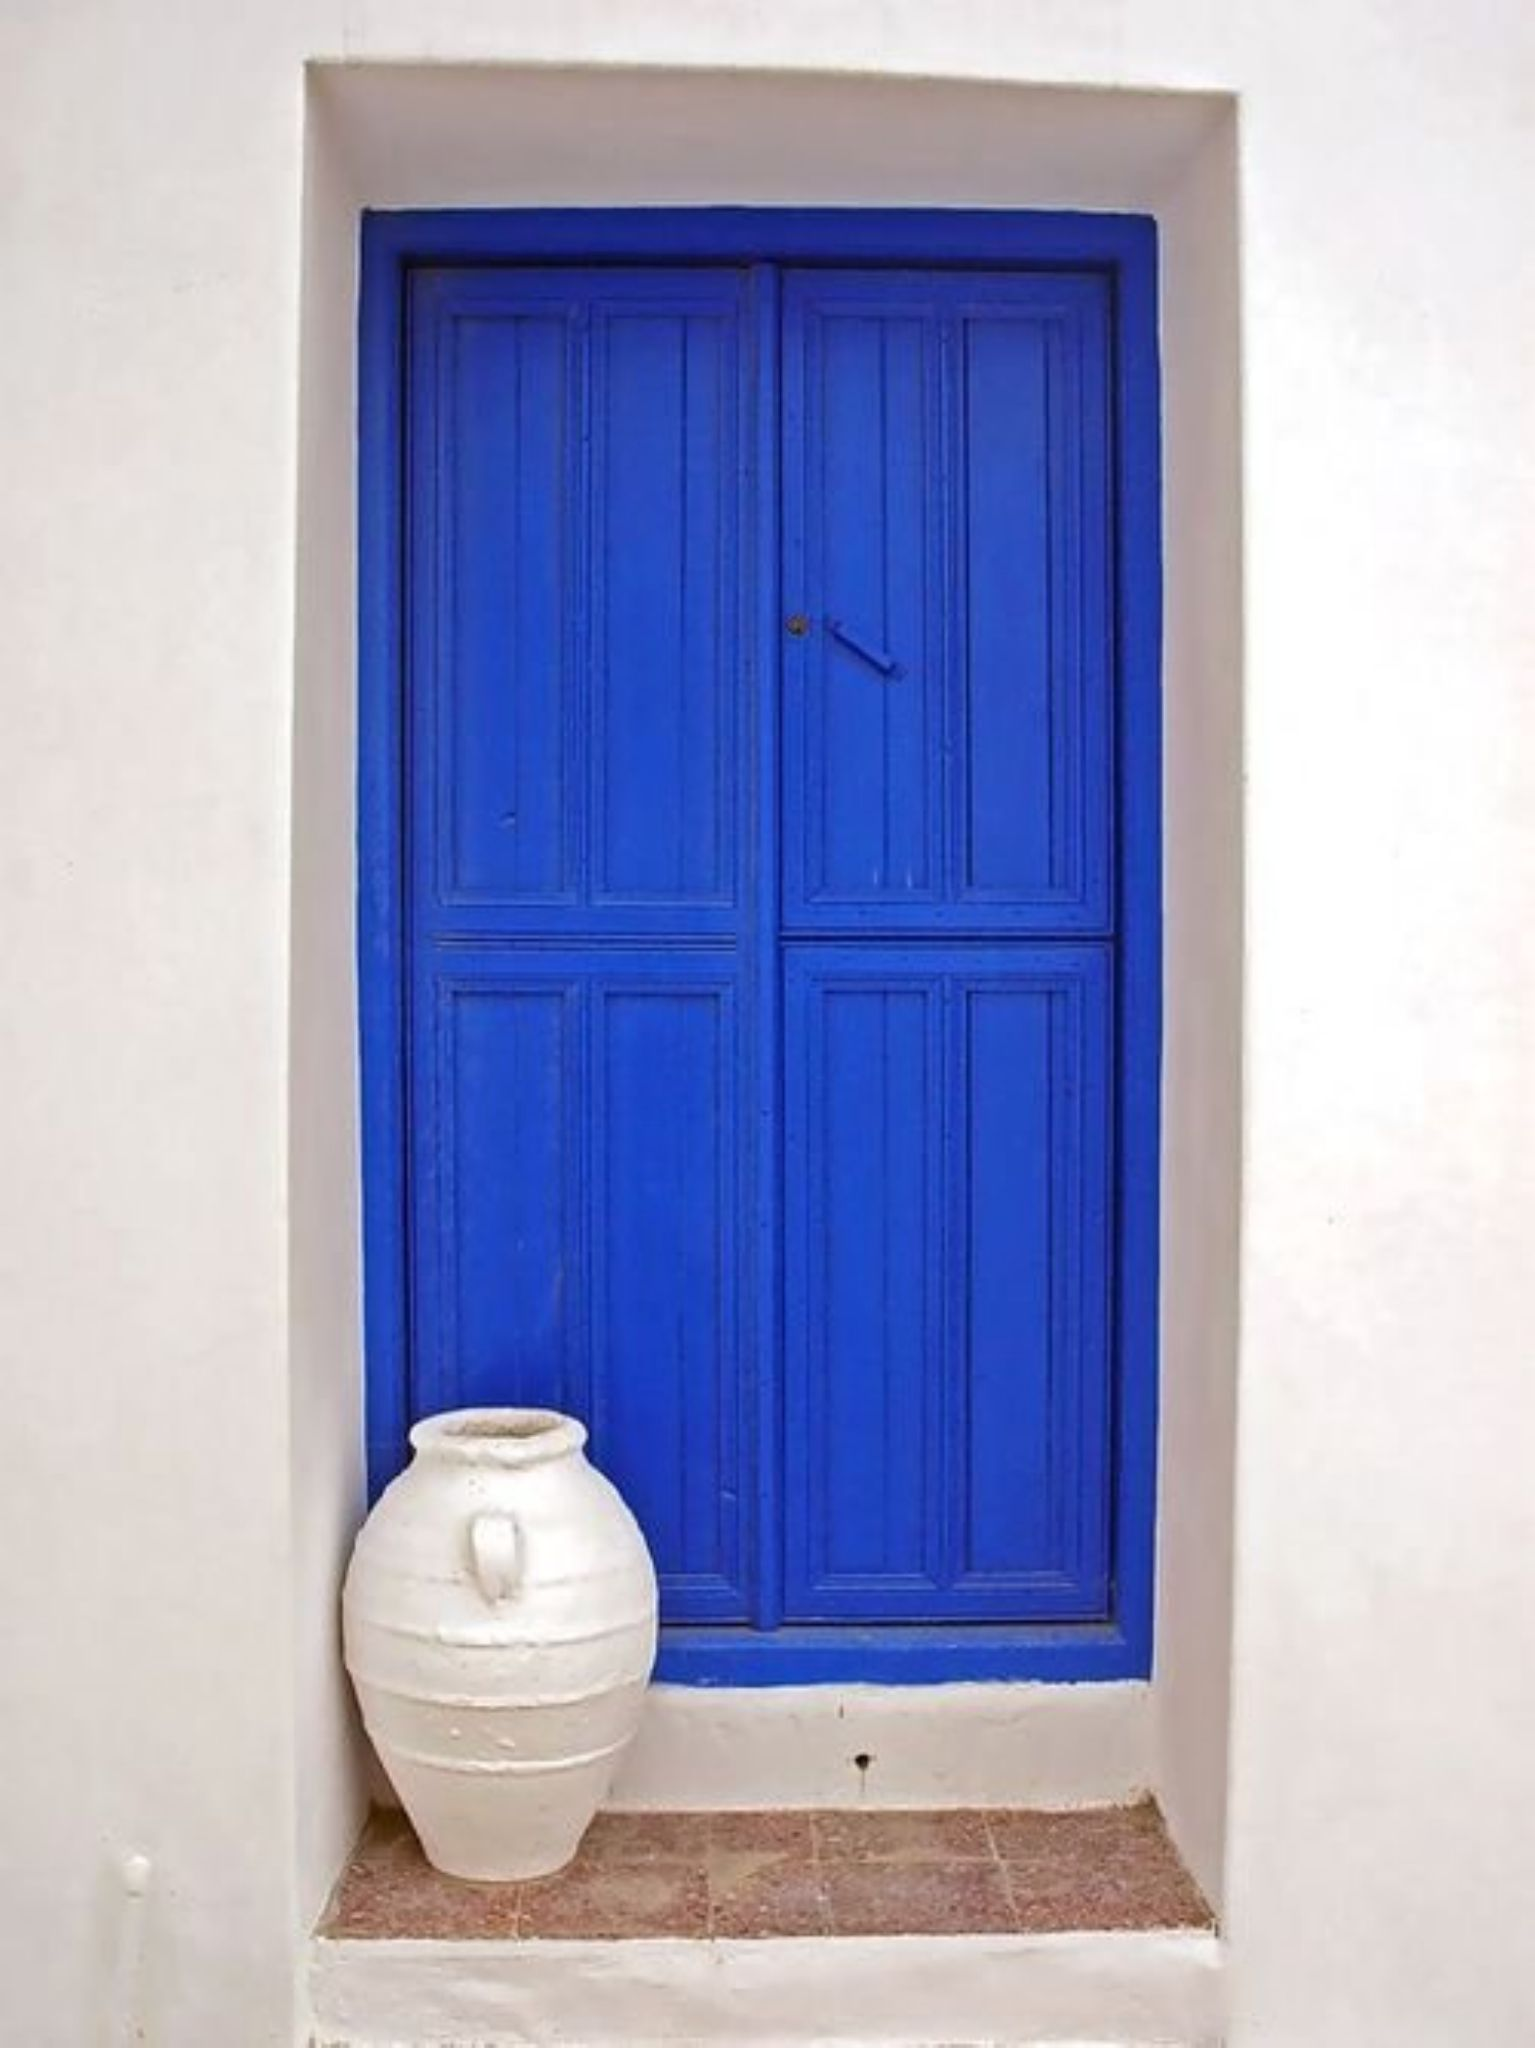 Doorway on Kasos Island, Greece by kasiospaul